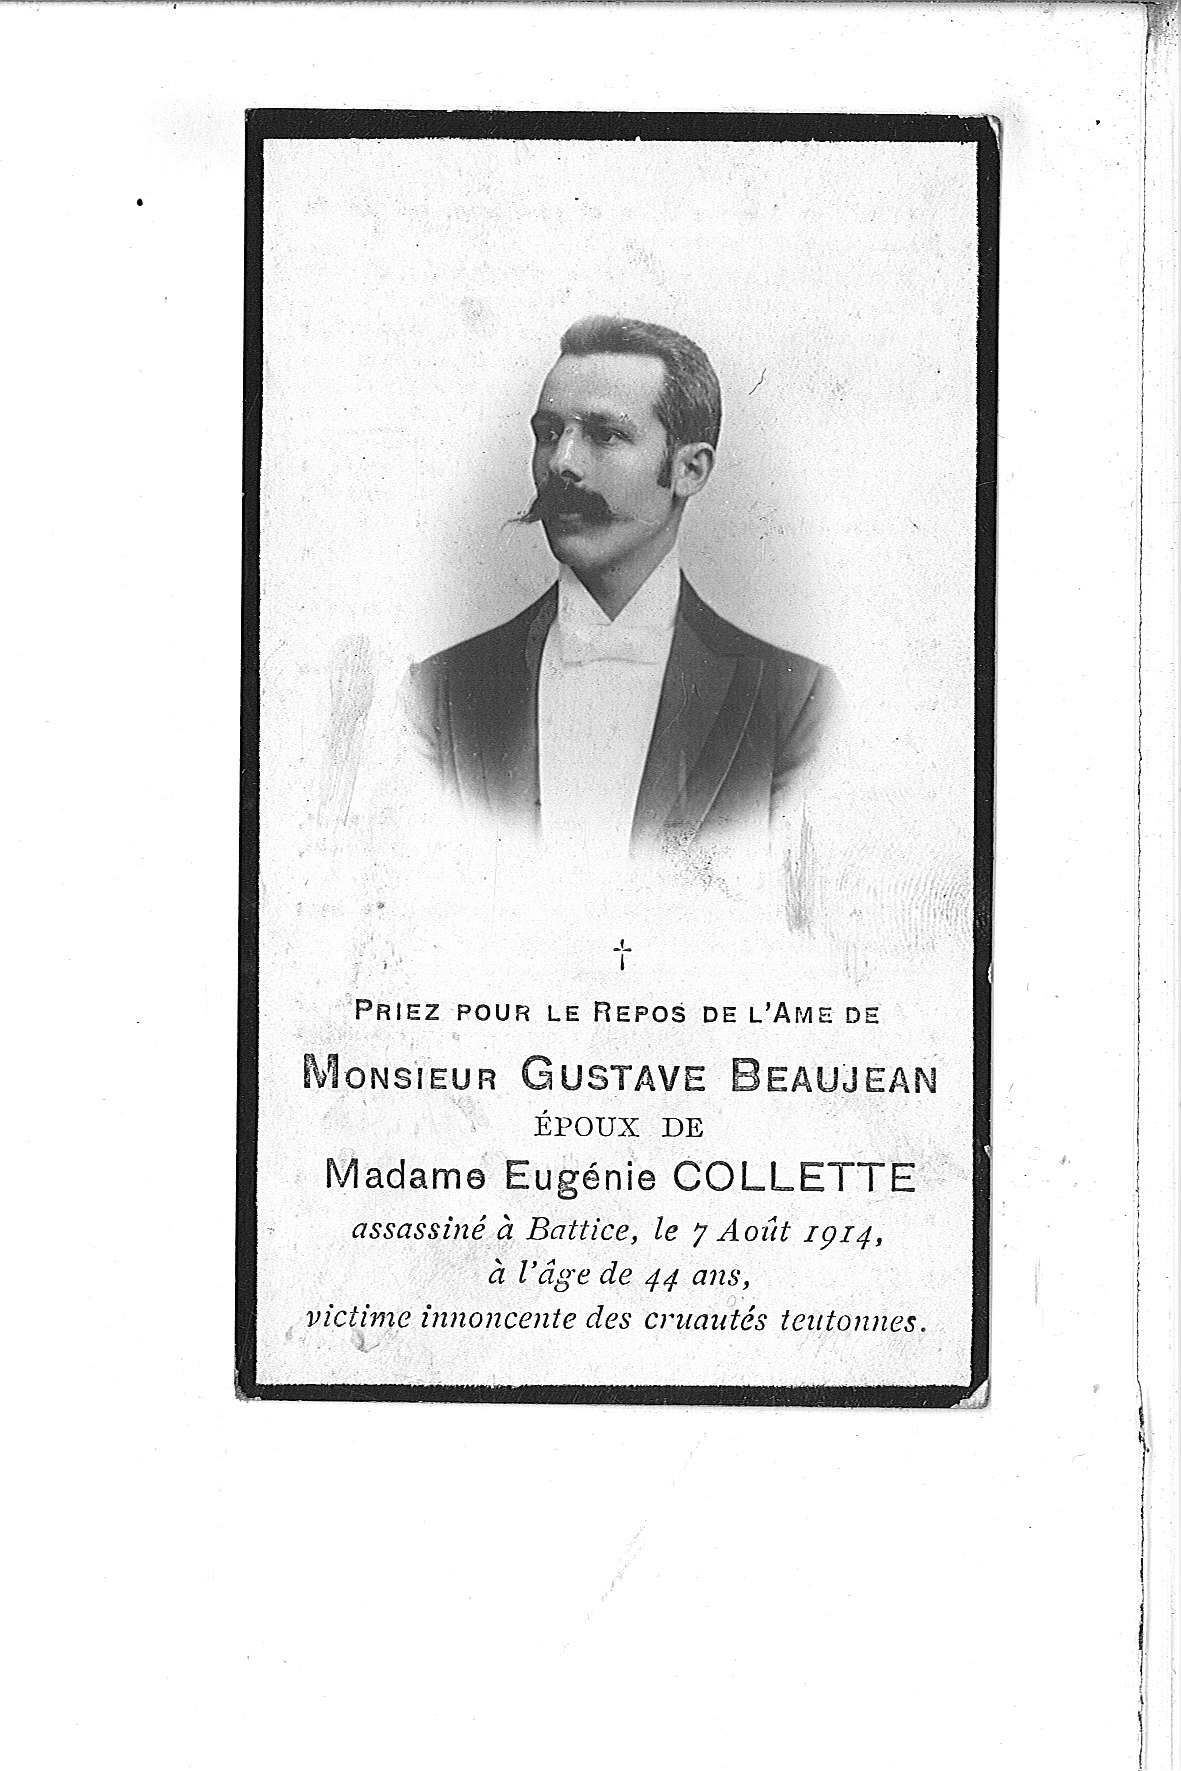 Gustave(1914)20101117115323_00017.jpg